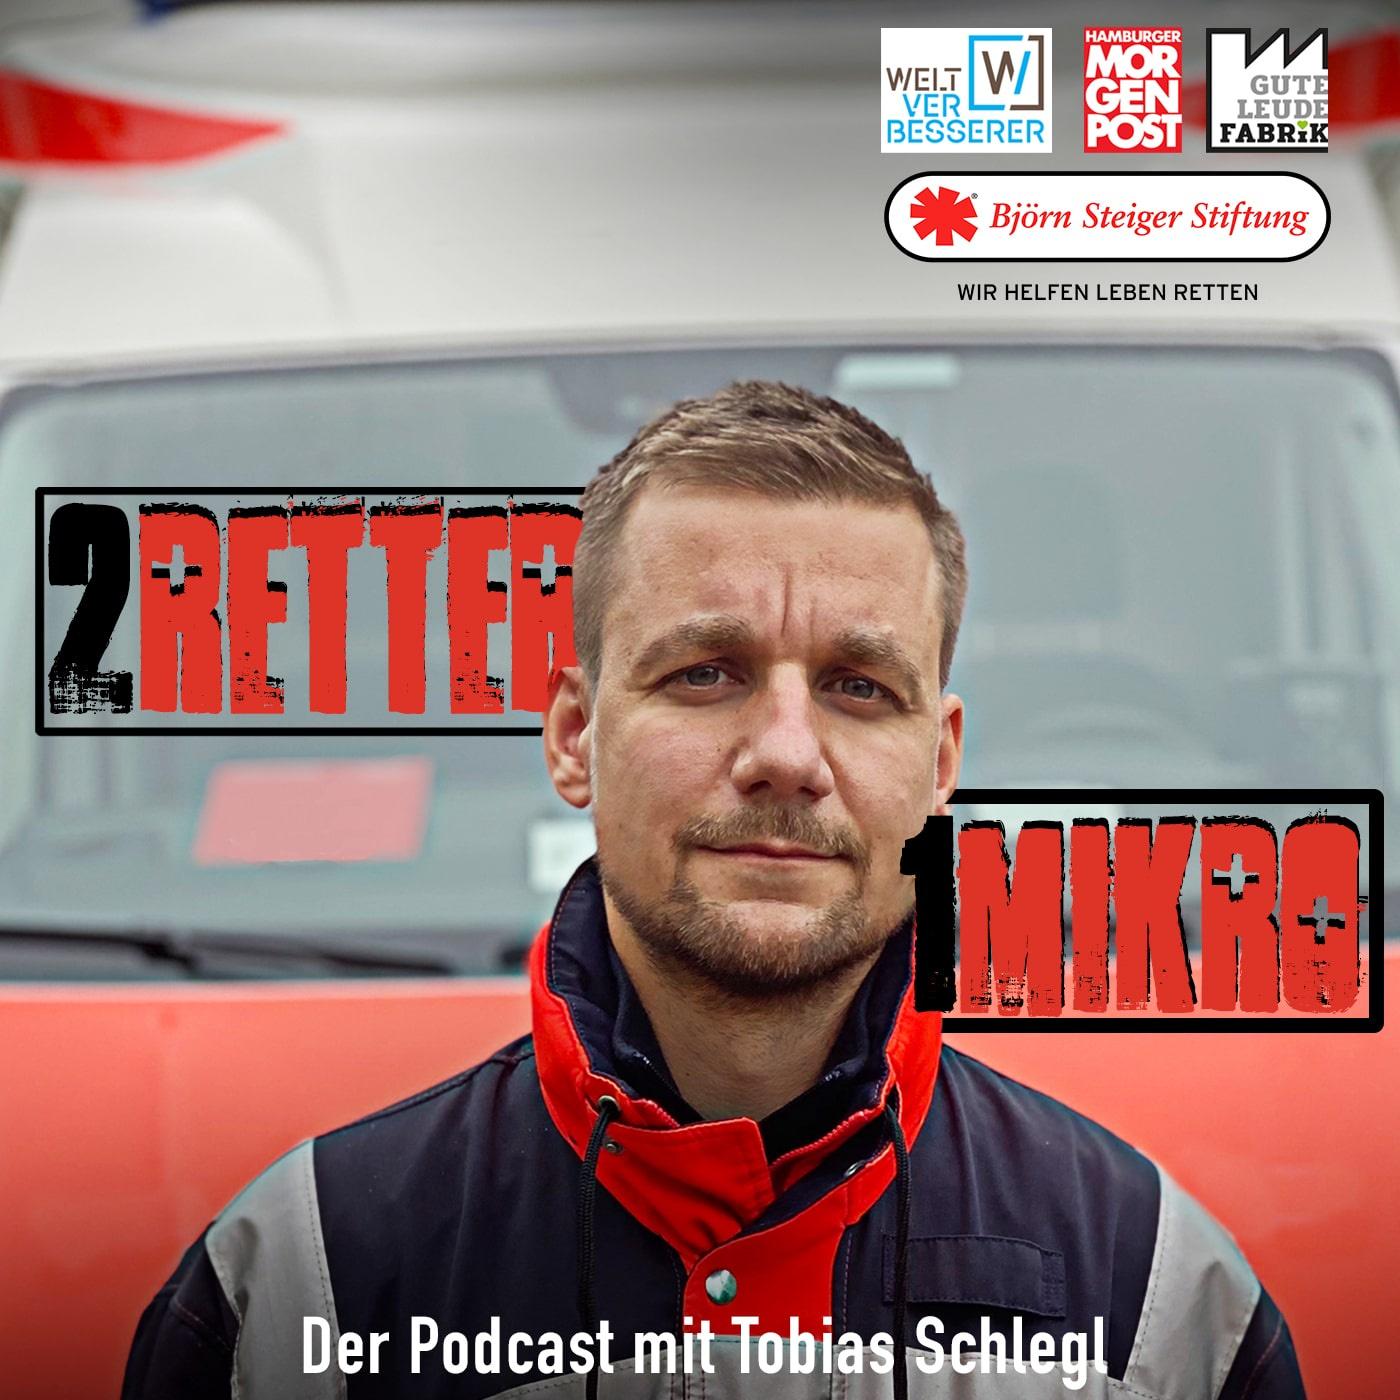 Folge 12 mit Sontje, Auszubildende zur Notfallsanitäterin